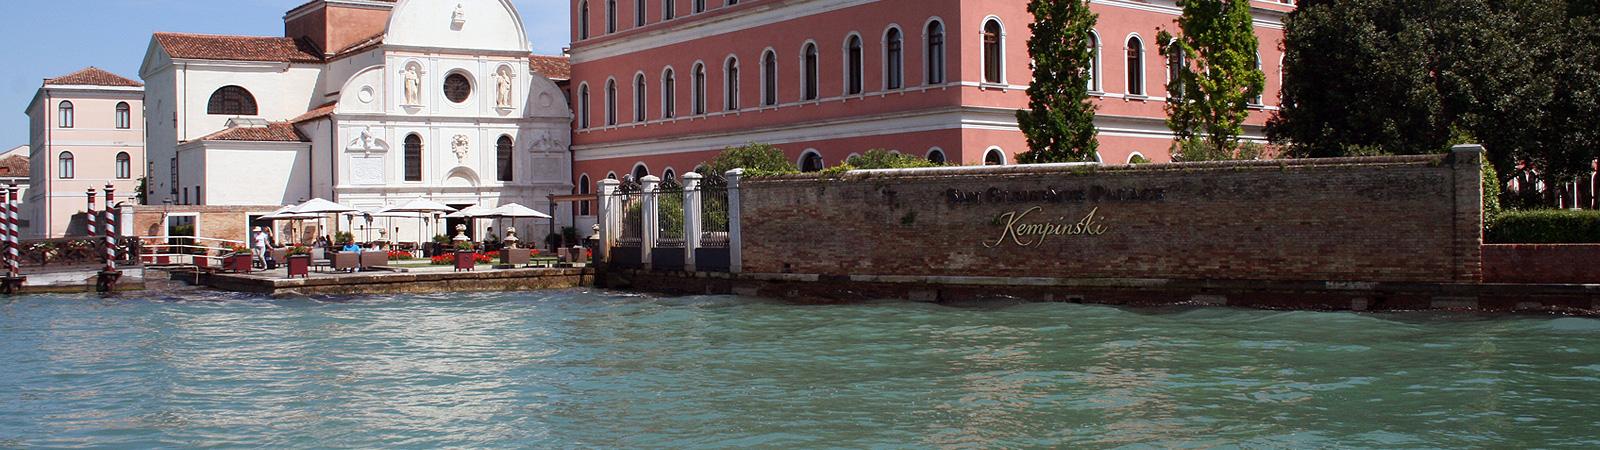 FYLE Kempinski Venedig